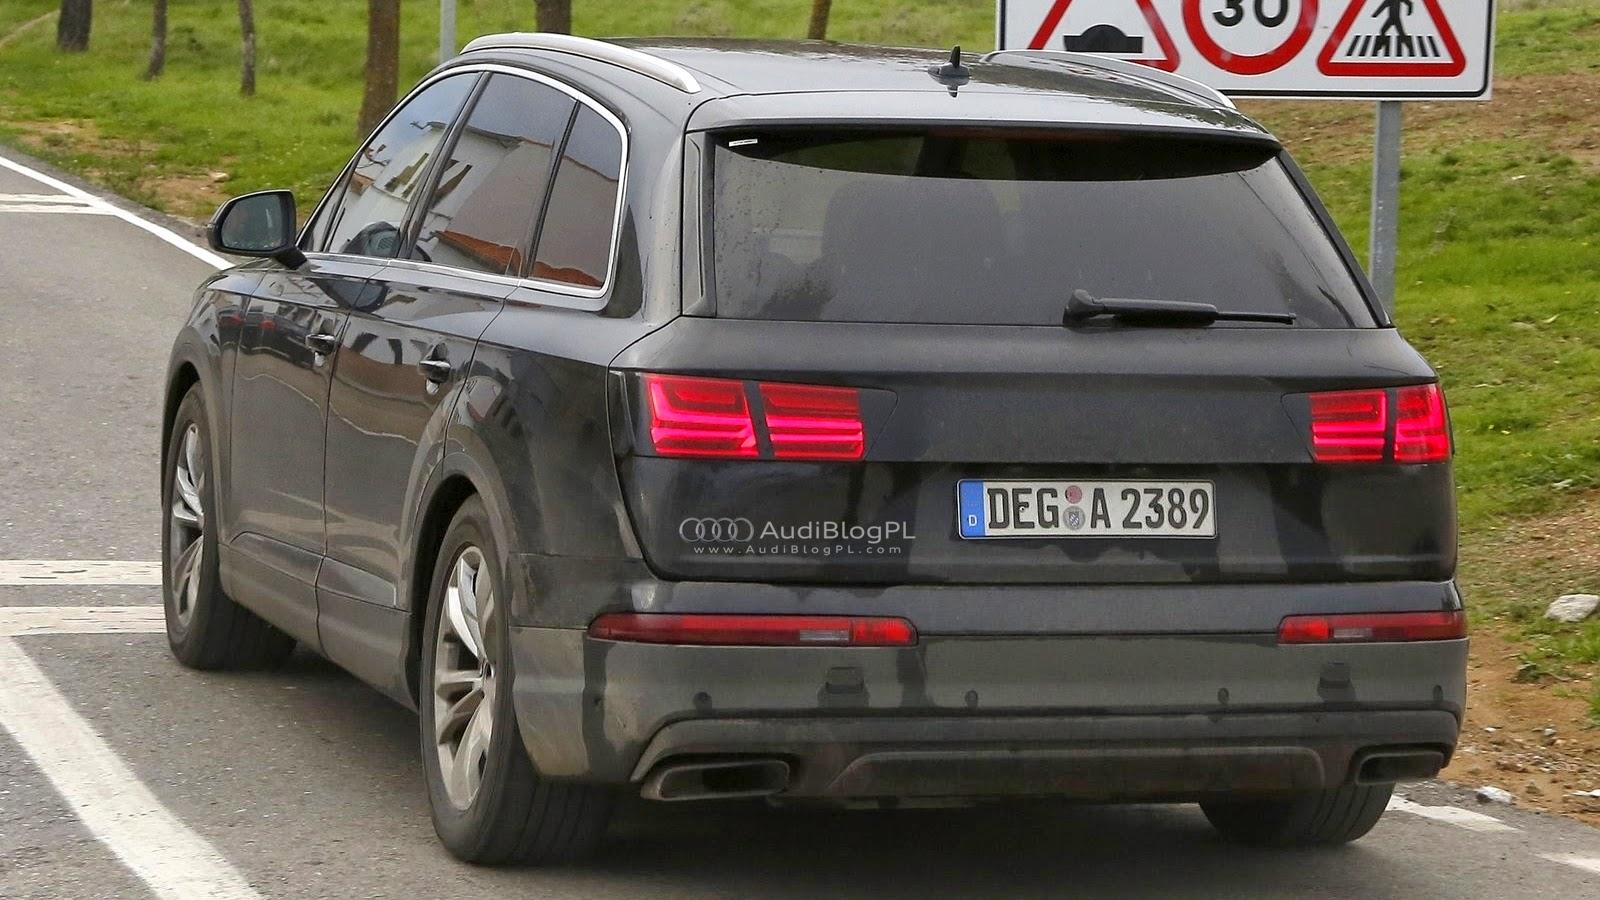 AudiBlogPL: SpyShots: Audi Q7